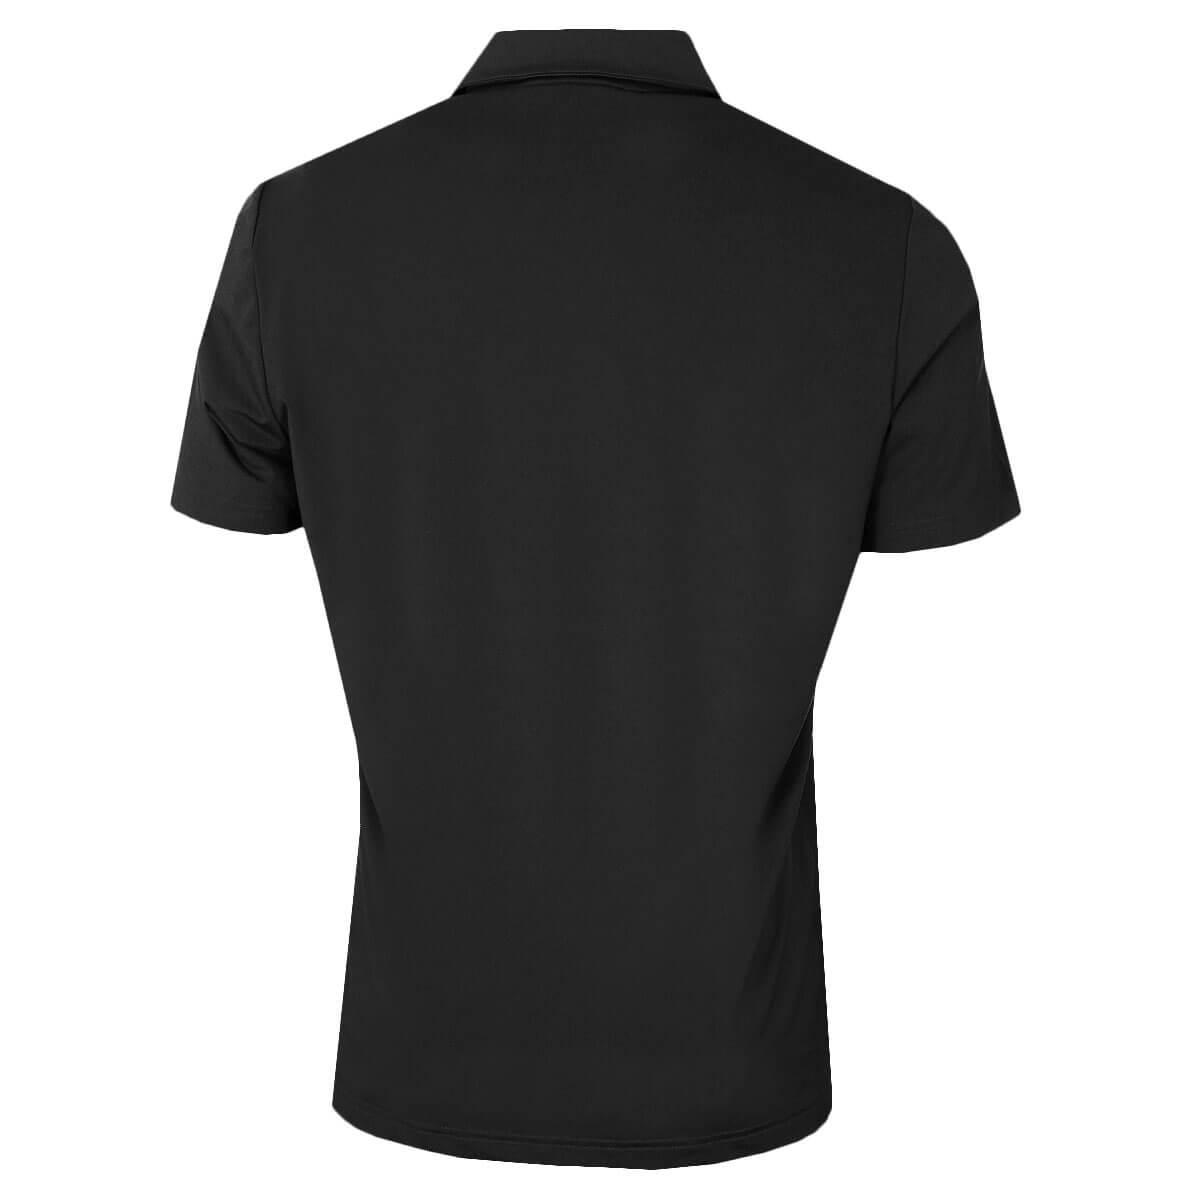 Adidas-Golf-Men-039-s-Ultimate-2-0-Solid-Crestable-Polo-Shirt thumbnail 3